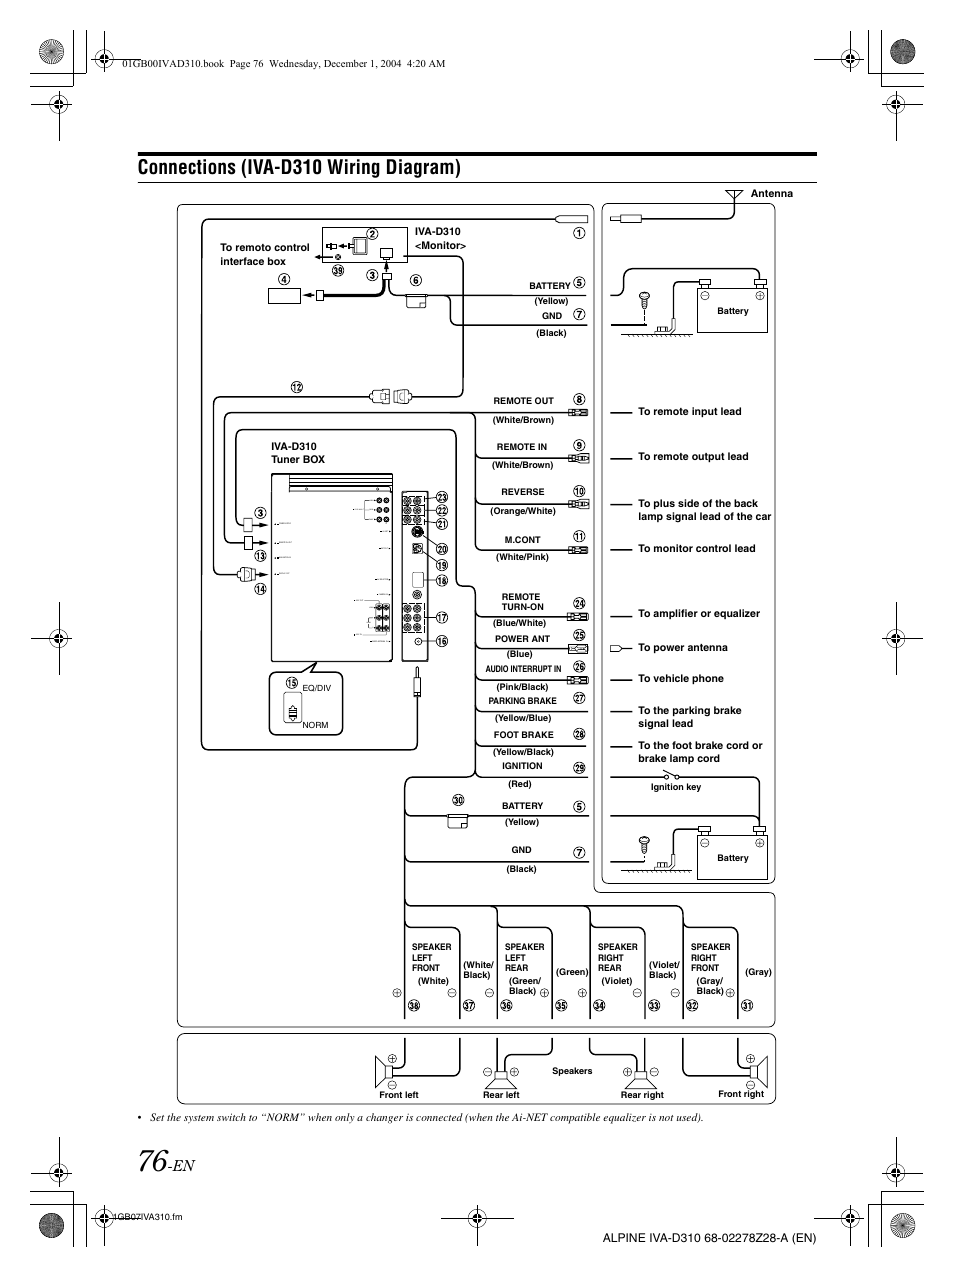 alpine iva d310 page78?resize\\\\\\\\\\\\\\\=665%2C891 wiring diagram 2004 sun deck gandul 45 77 79 119  at gsmportal.co